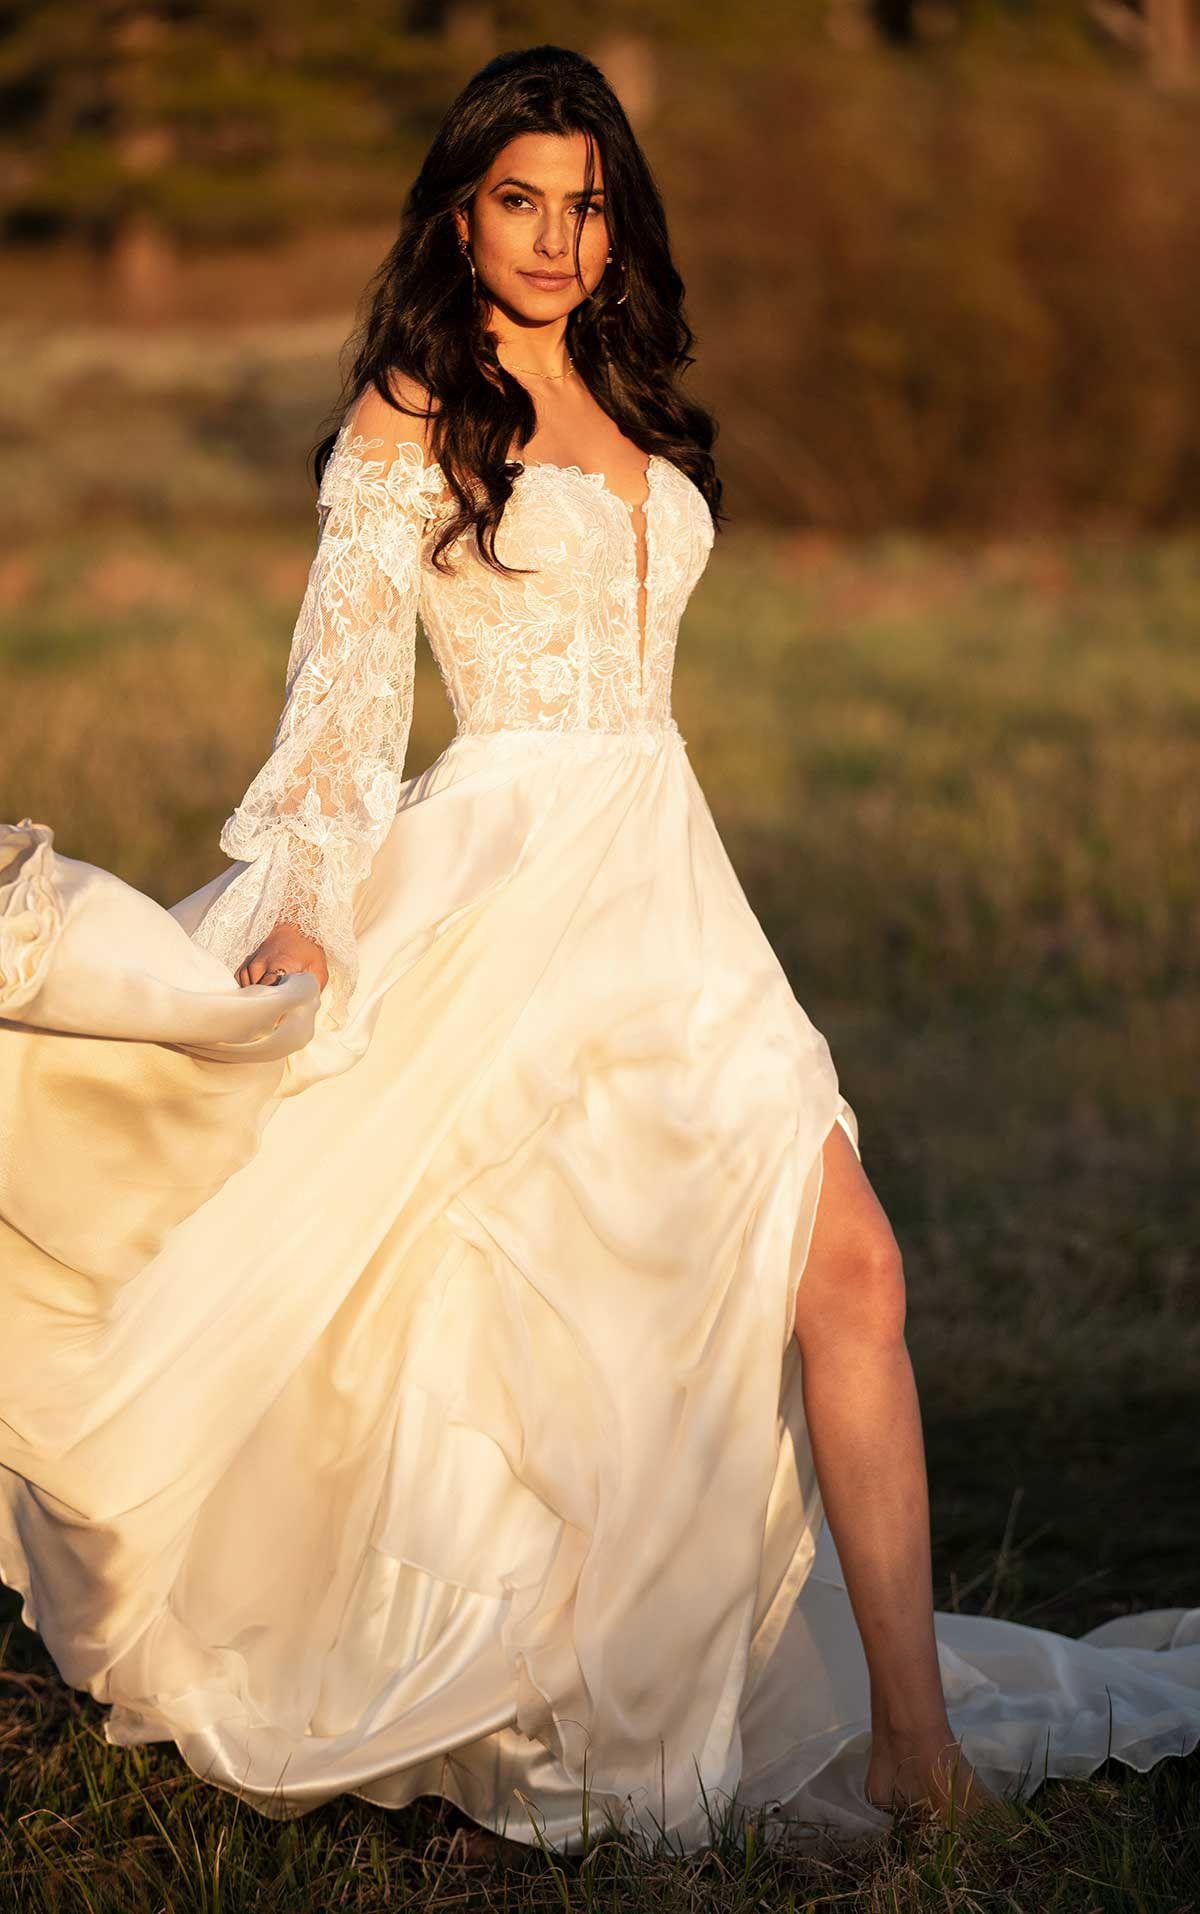 Finn Wedding Dress All Who Wander Boho Chic Wedding Dress Chic Wedding Dresses Wedding Gowns [ 1914 x 1200 Pixel ]